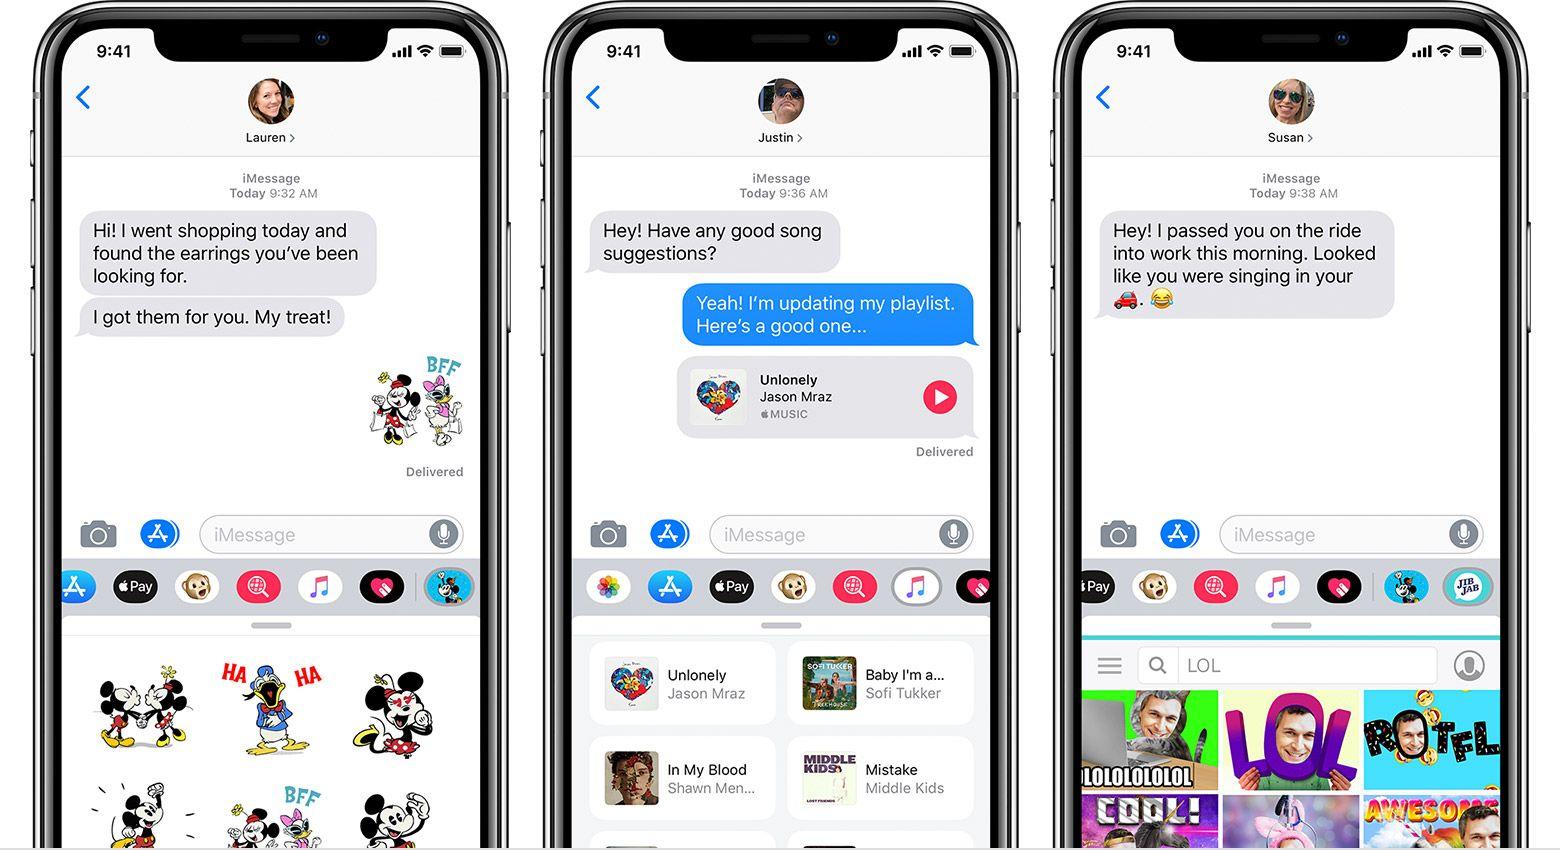 2ac35d309b74398c13b6856cf2e71c89 - How To Get Text Messages On My Ipad And Iphone